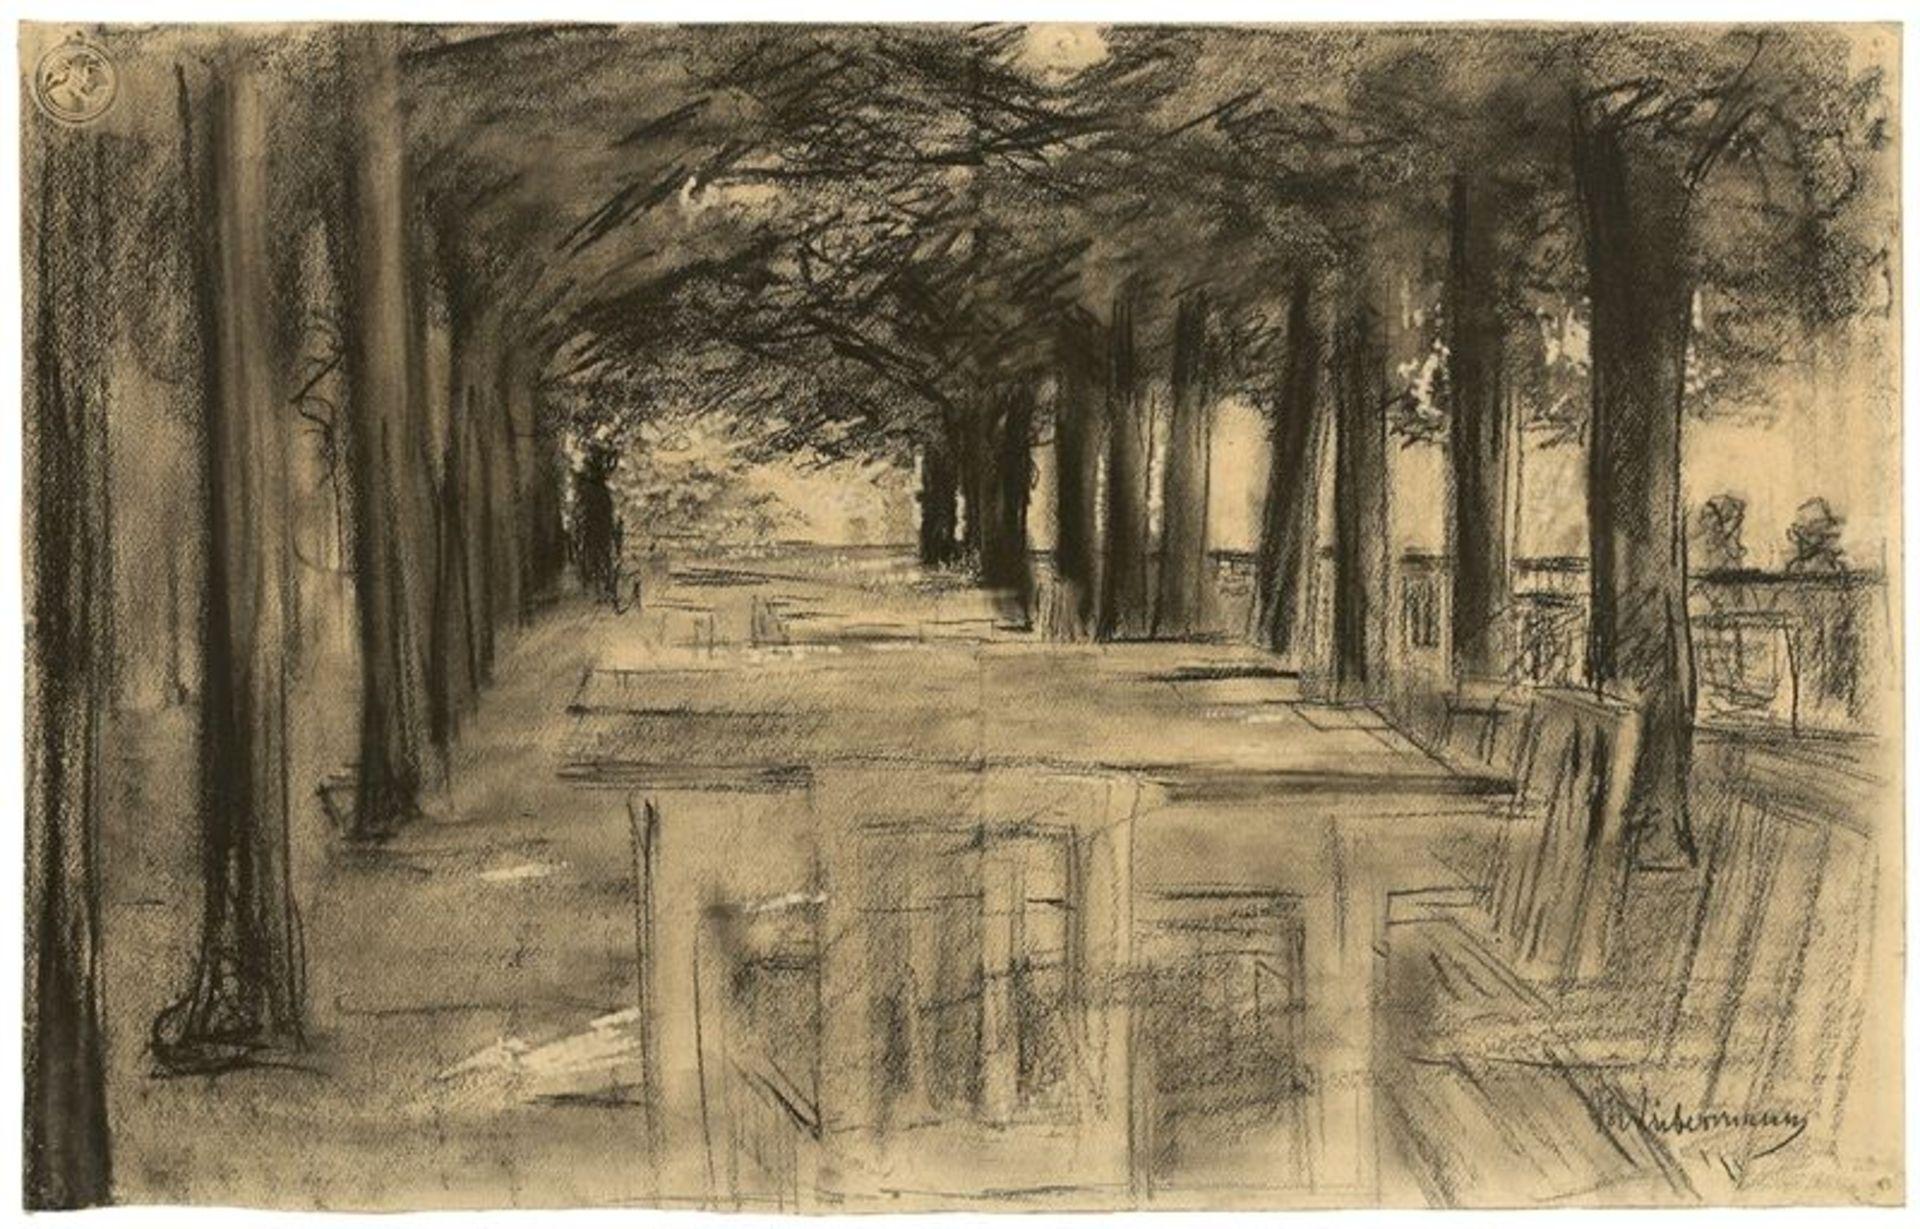 Los 113 - Max Liebermann (1847 – Berlin – 1935)